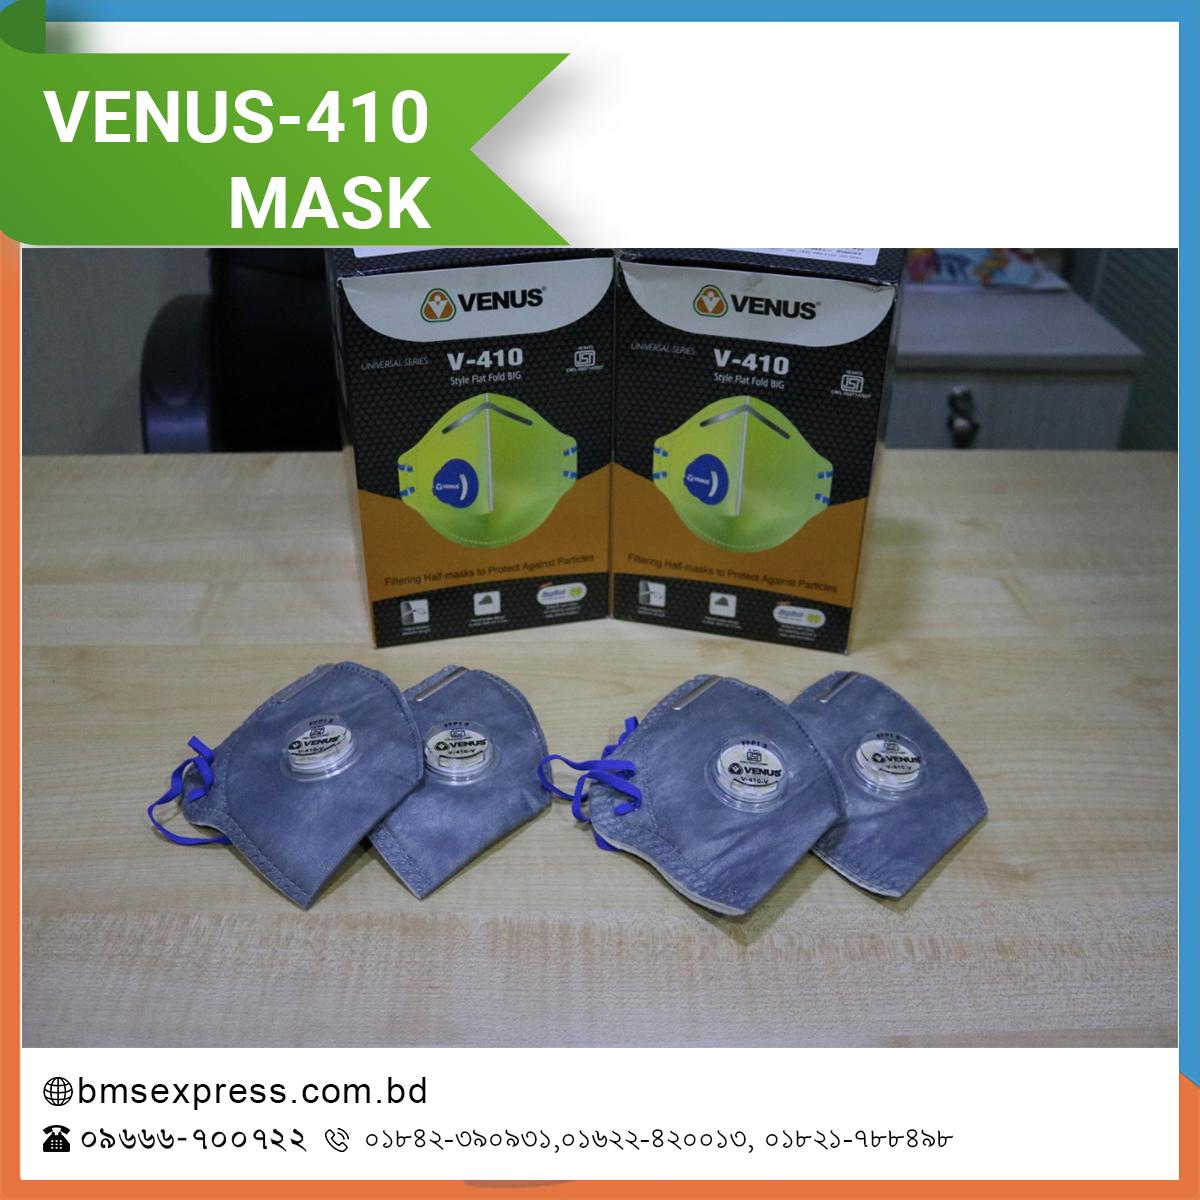 VENUS V-410 V Mask